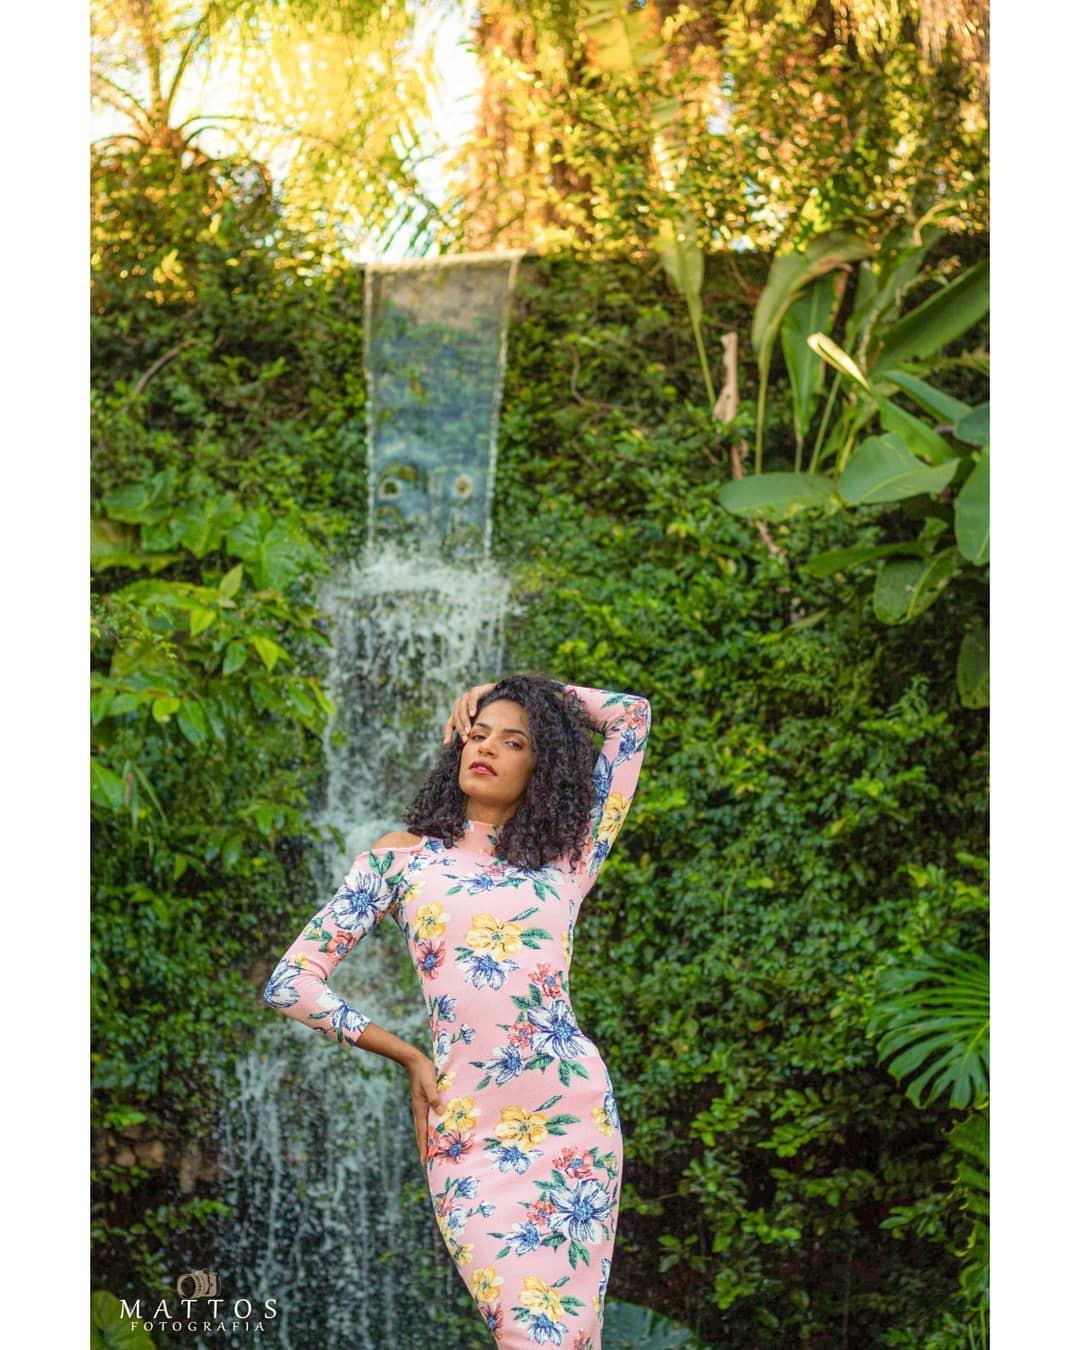 geicyelly mendes, top 20 de miss brasil mundo 2019. Fwn04110